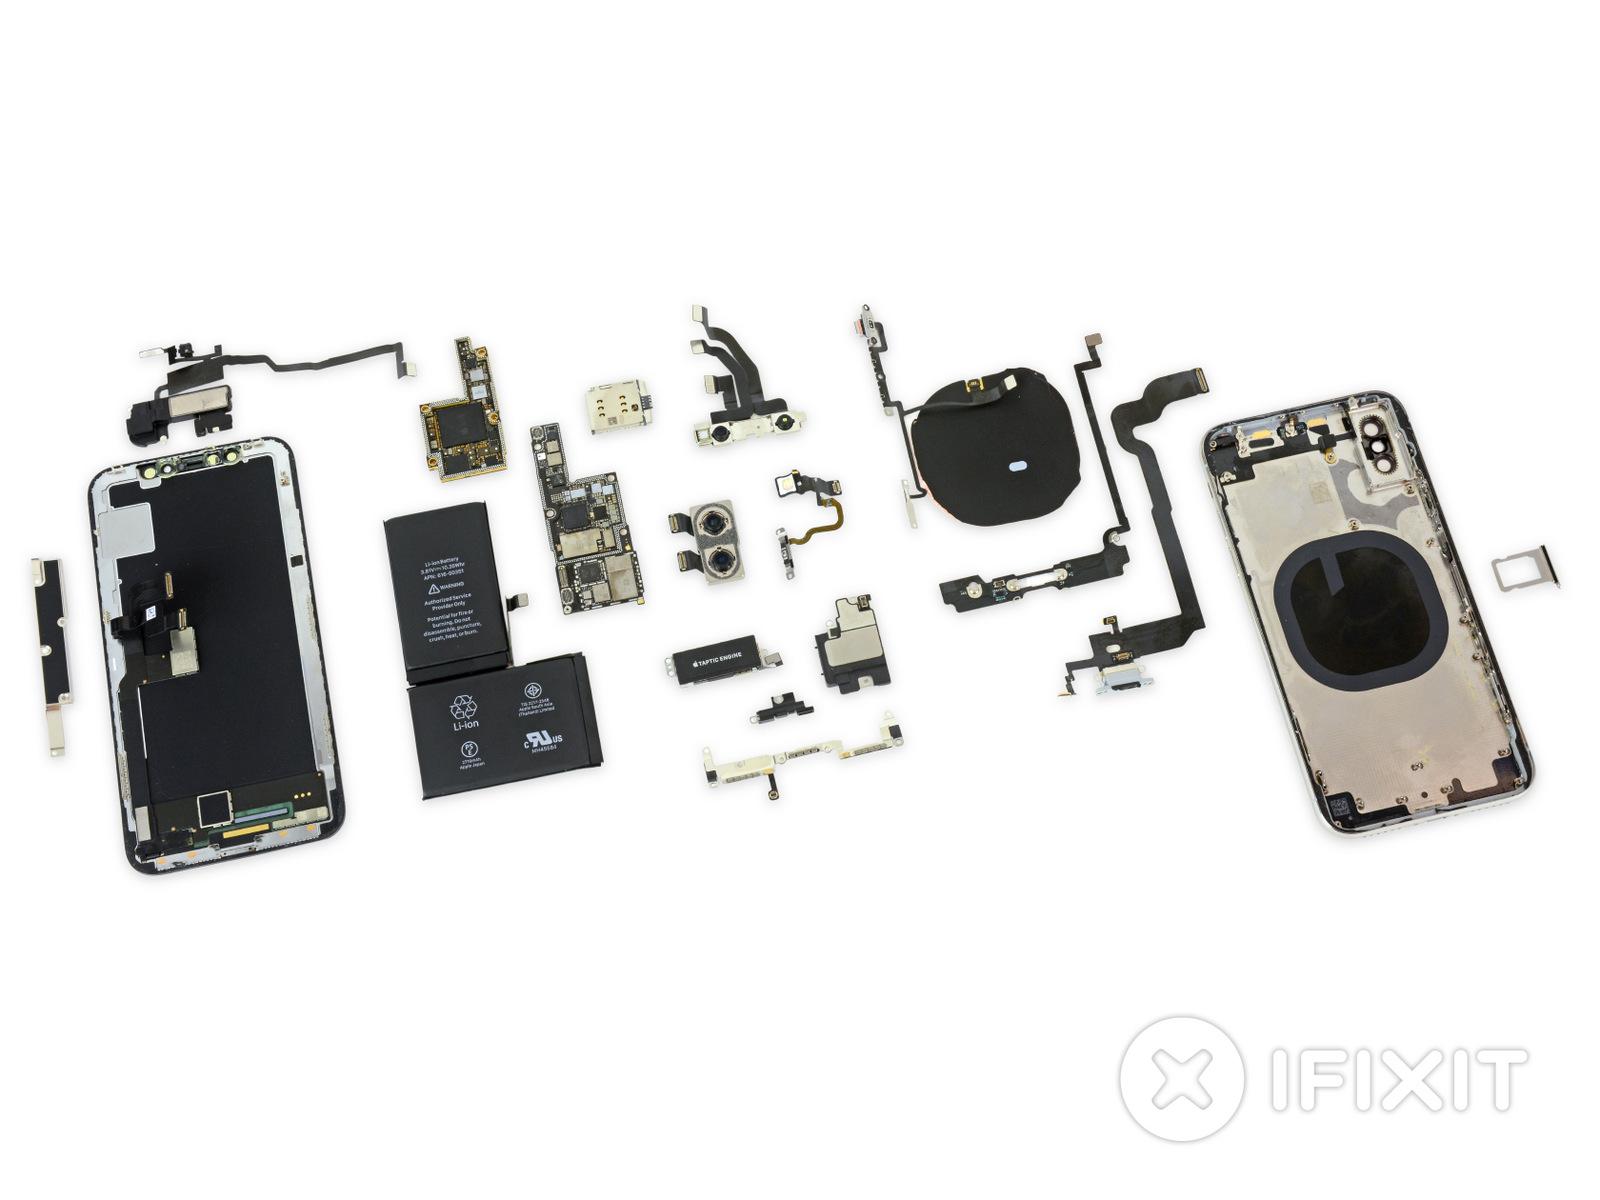 iPhone-X-teardown-4